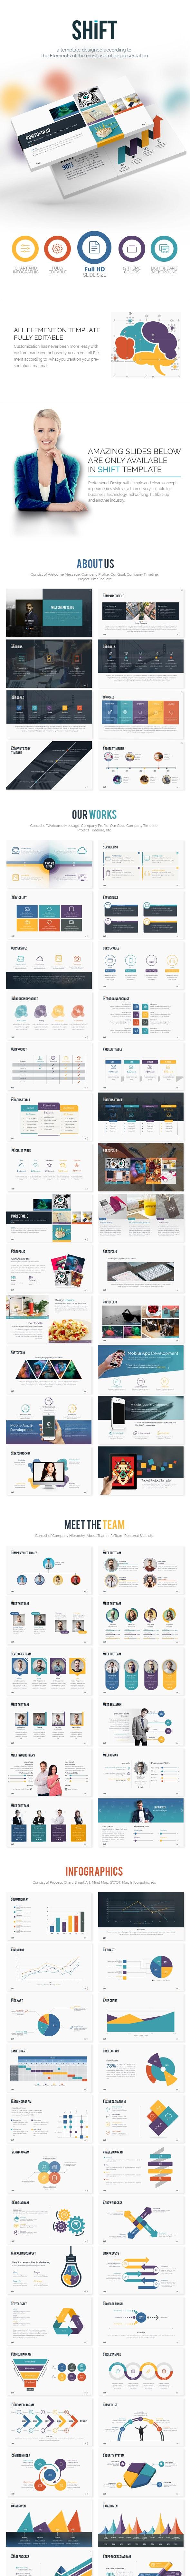 SHIFT Keynote - Multipurpose Keynote Template - Business Keynote Templates